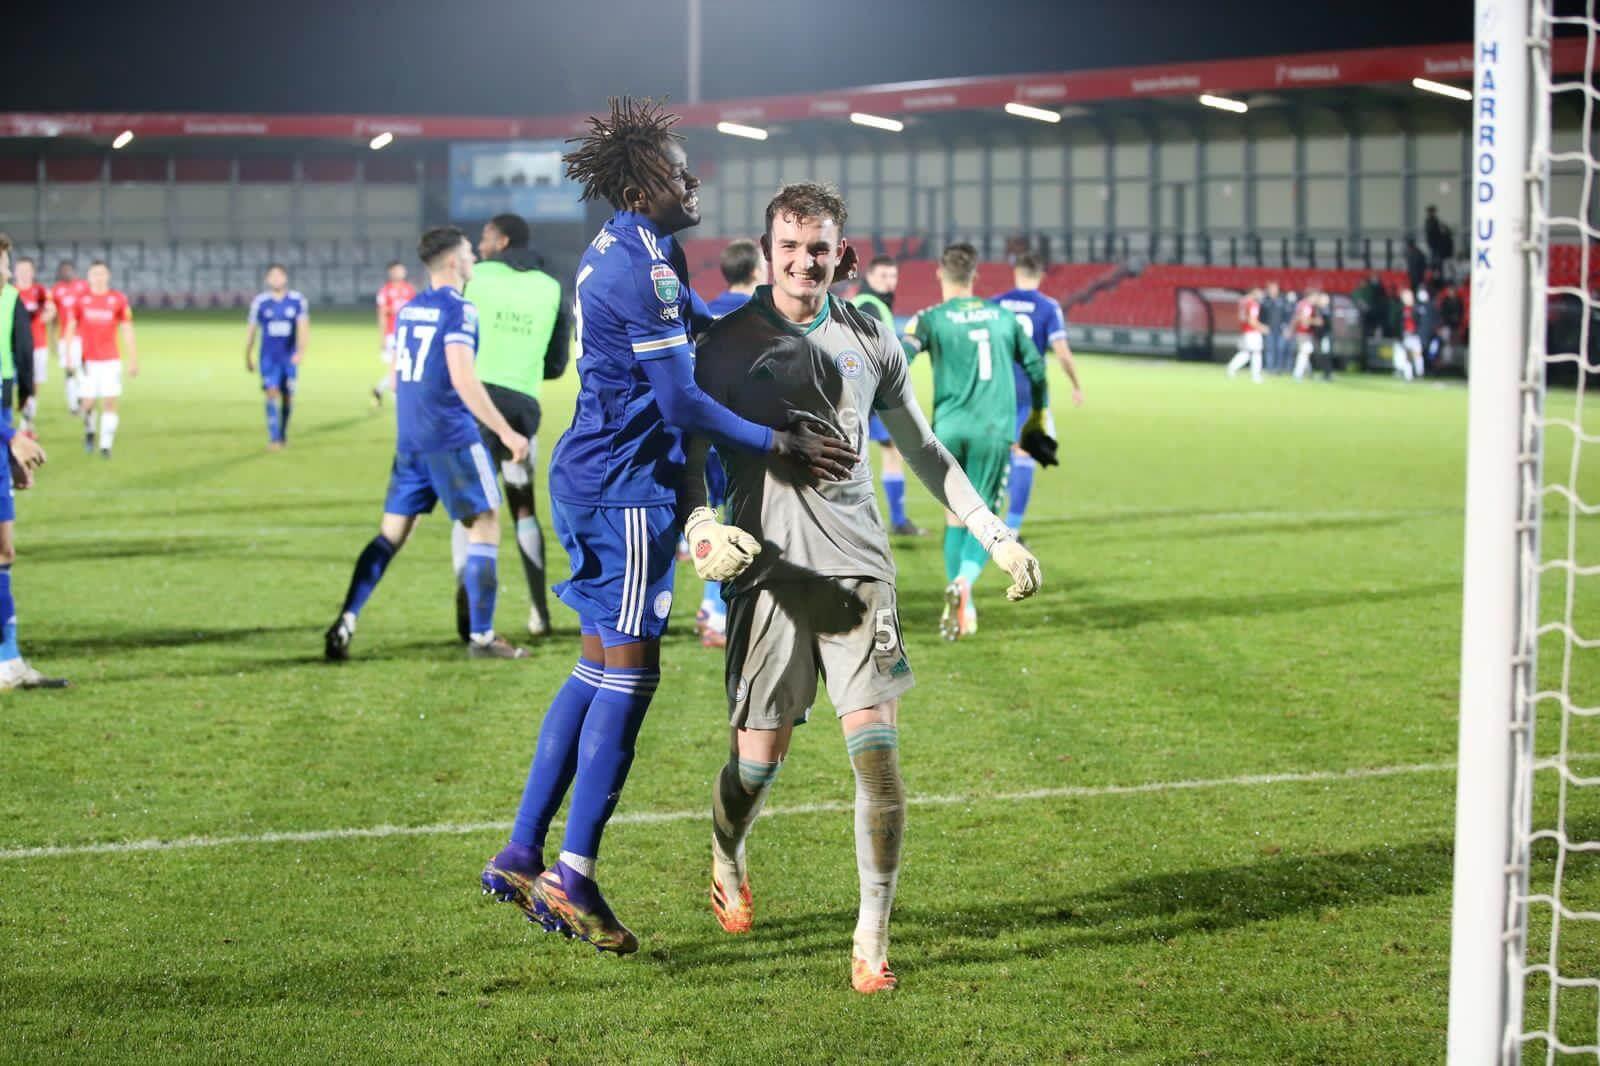 Jakub_Stolarczyk_-_Leicester_City.jpg